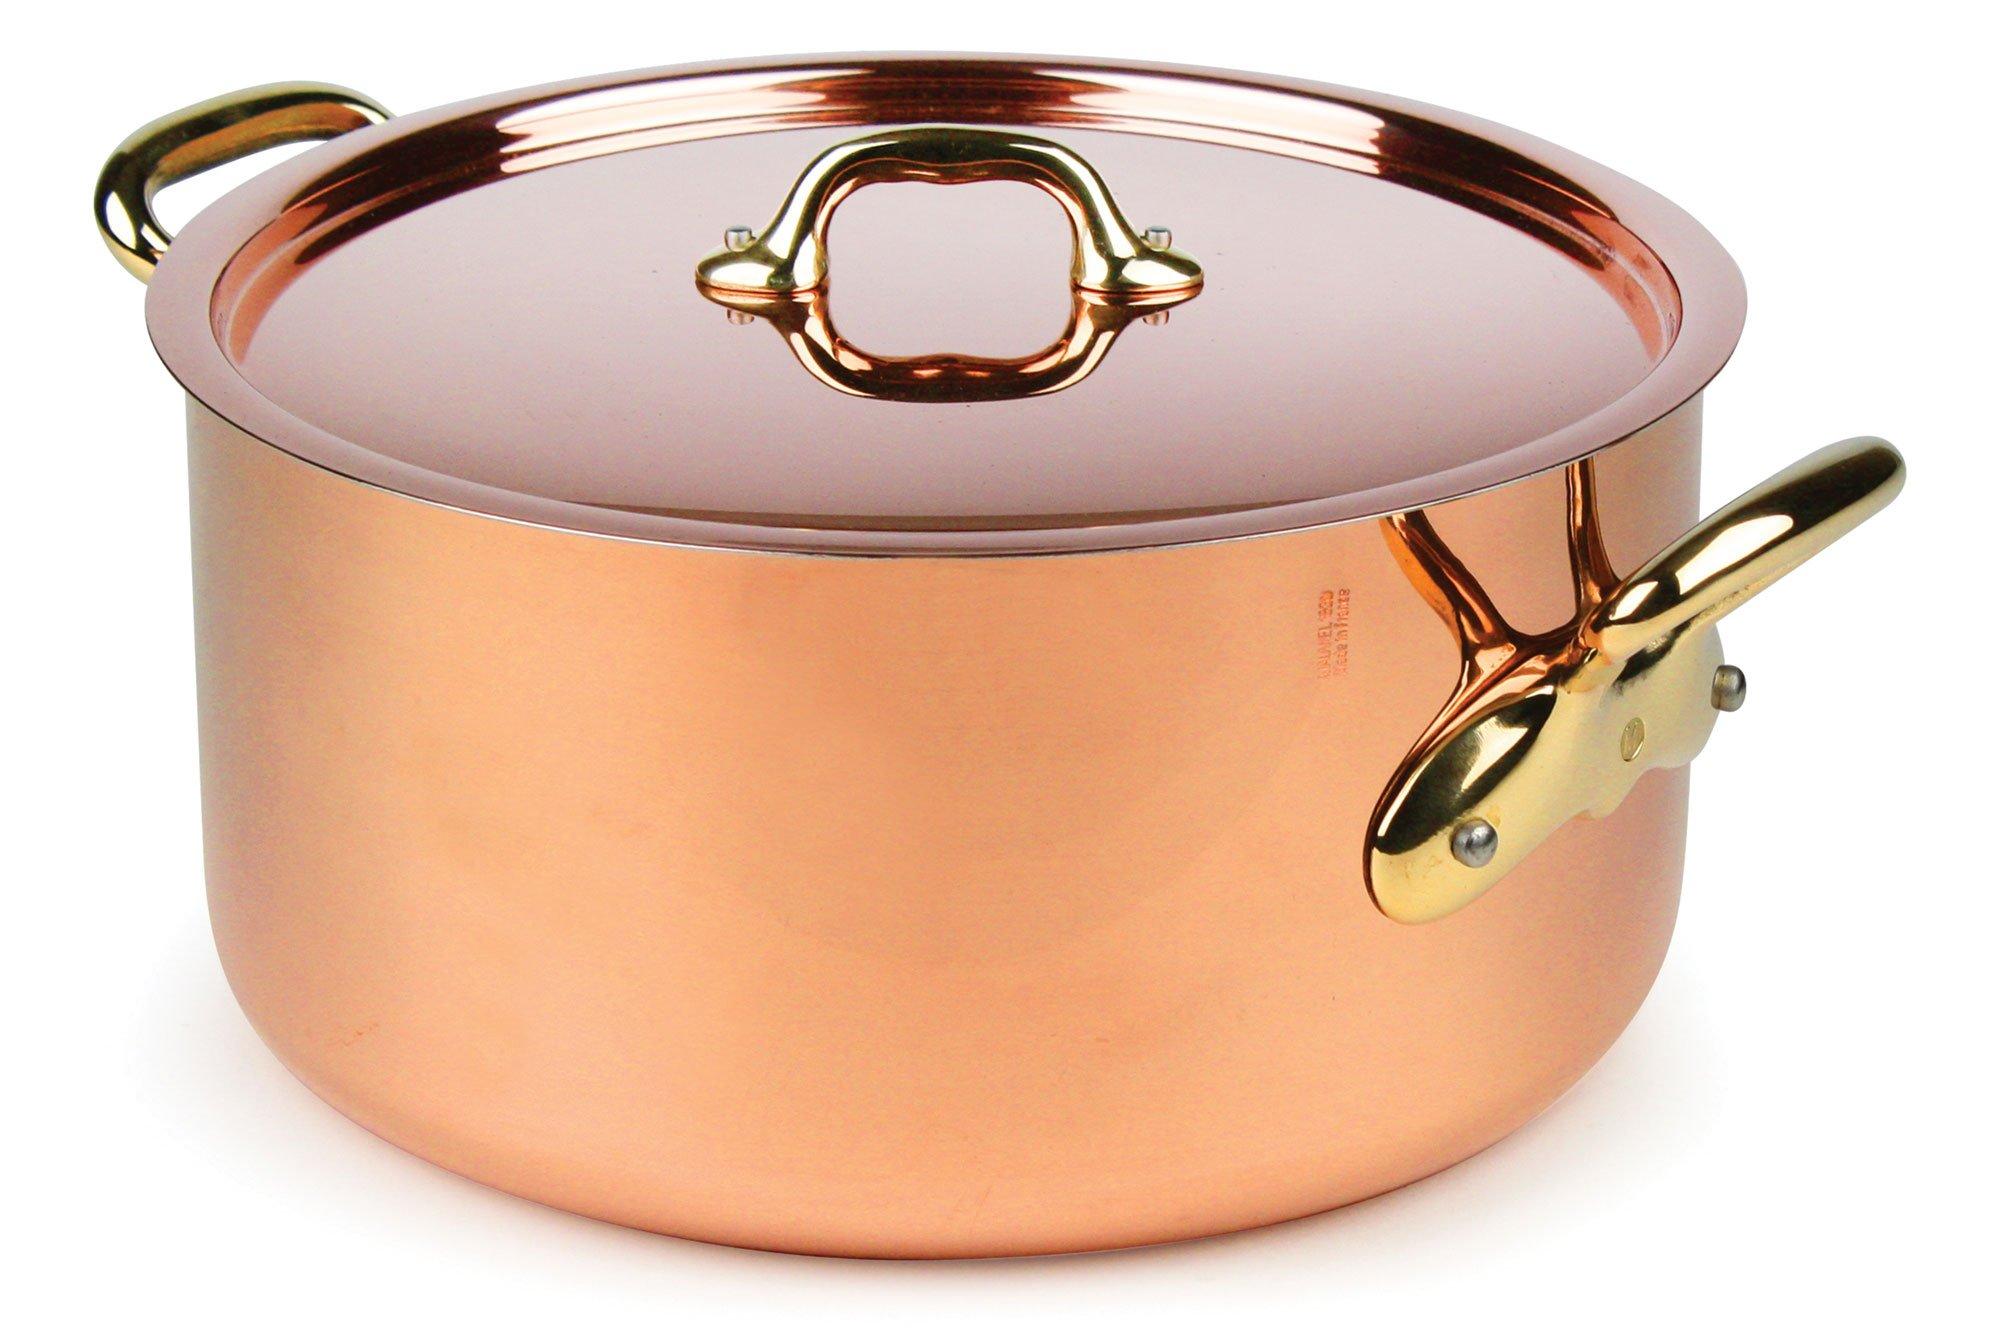 Mauviel M'heritage 250B 8.5-quart 2.5mm Copper Stock Pot with Bronze Handles